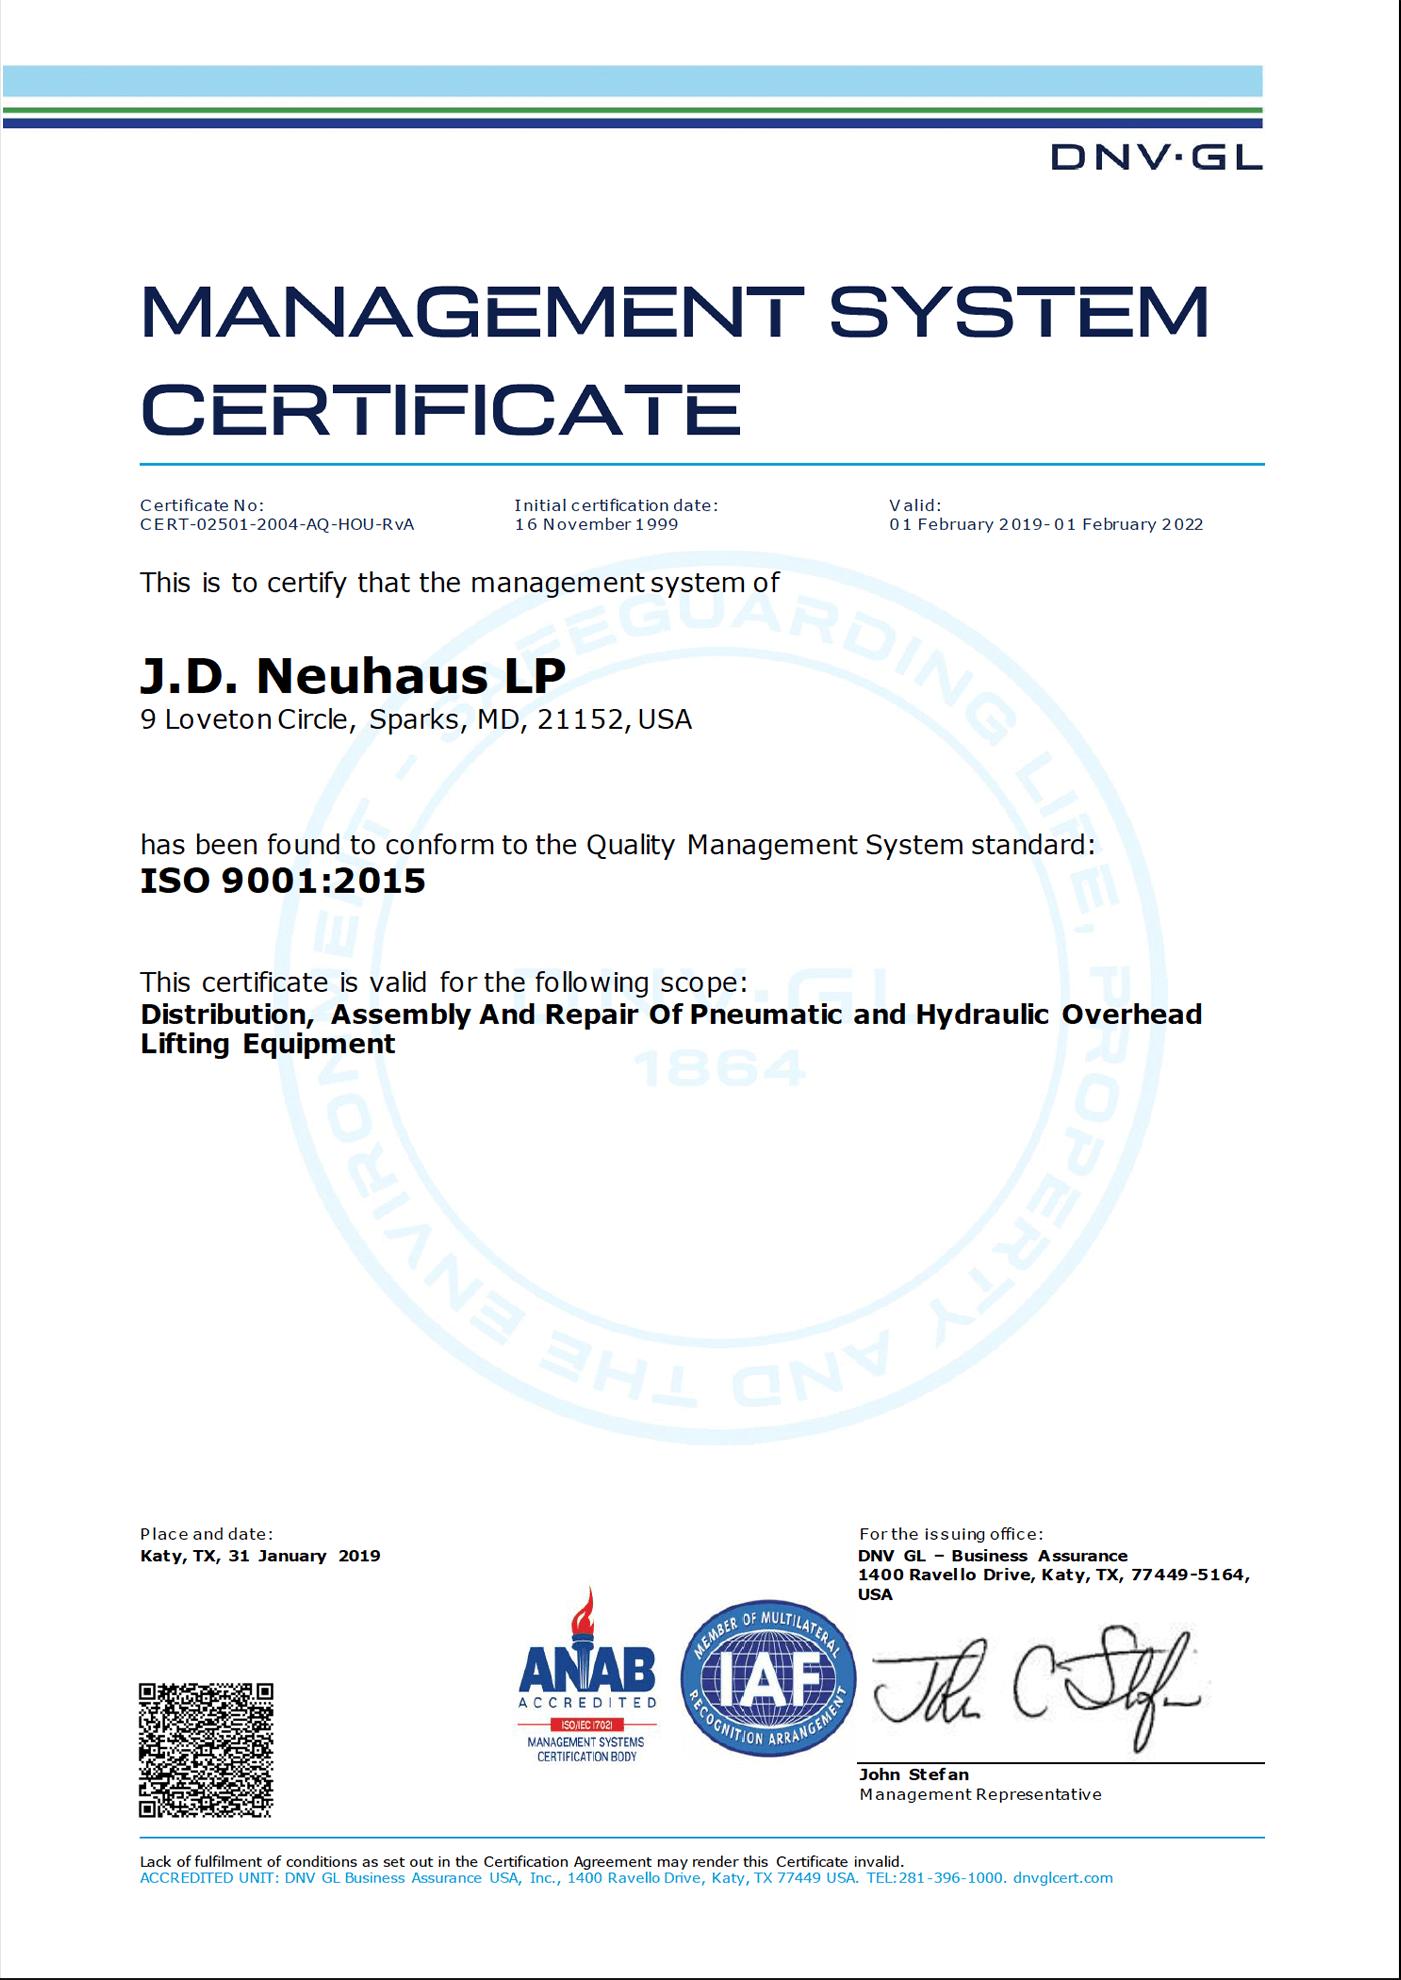 JD Neuhaus LP ISO 9001 2015